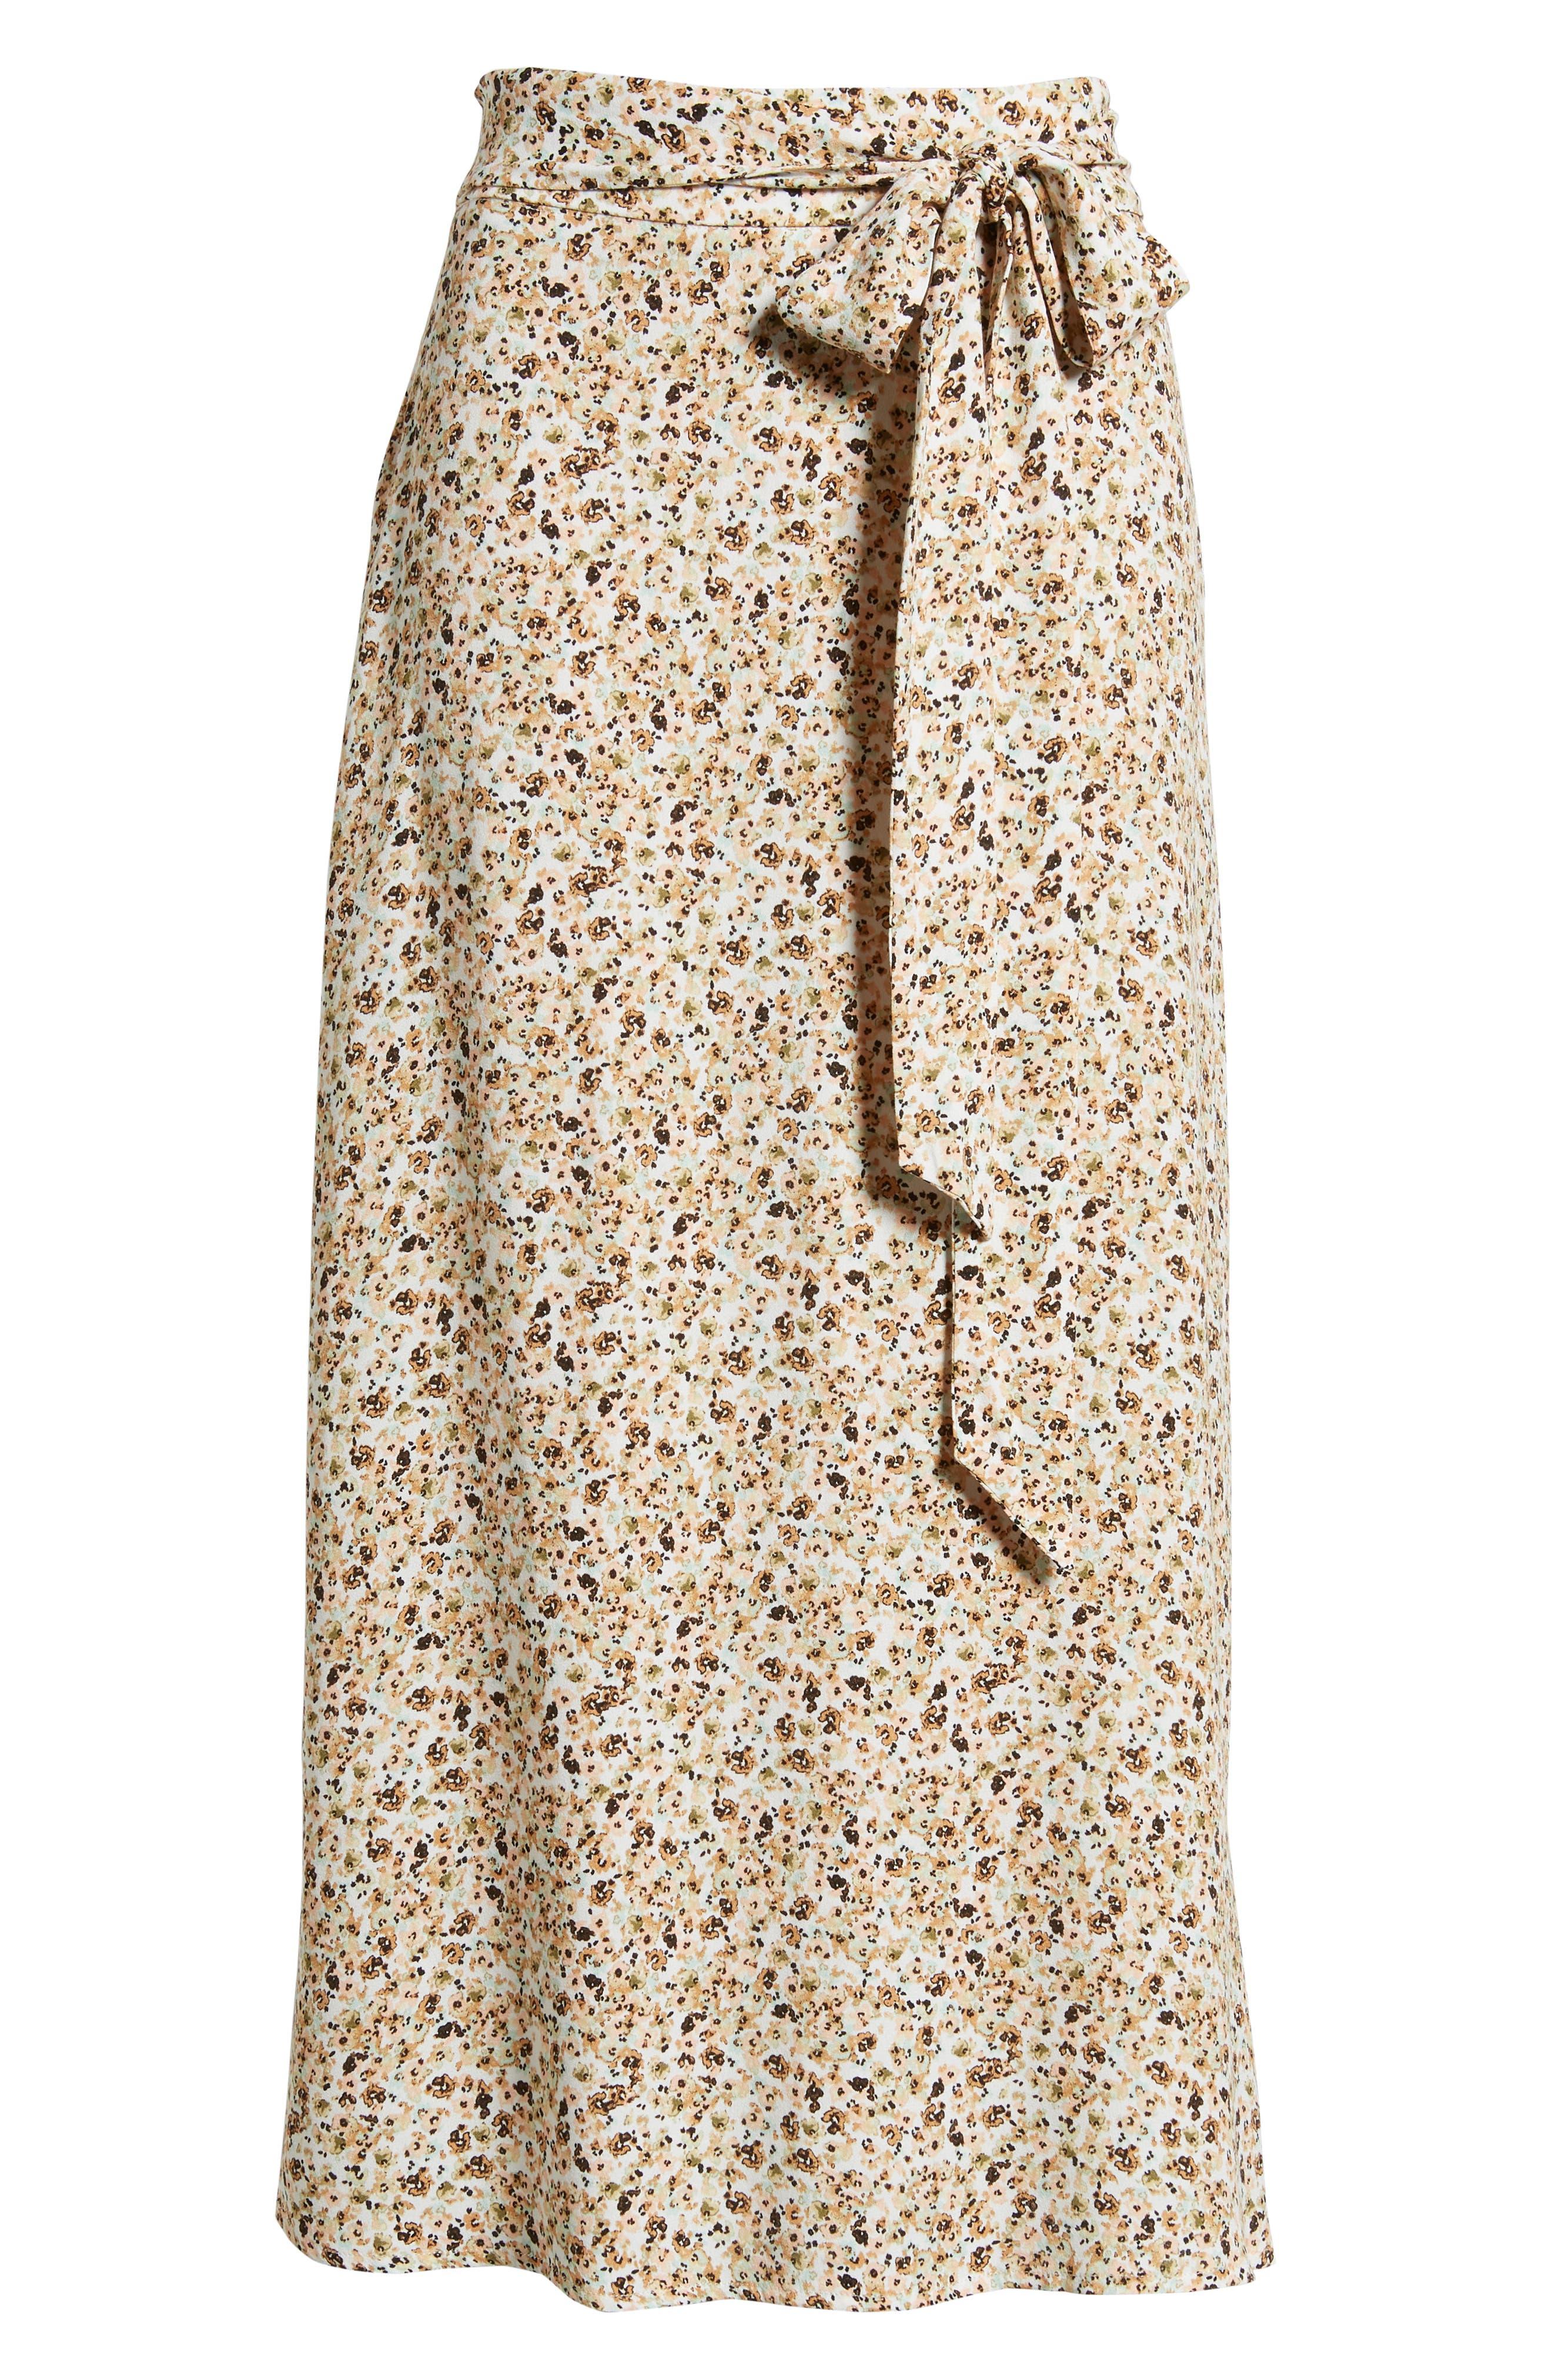 Mia Ruffle Midi Skirt,                             Alternate thumbnail 6, color,                             BEIGE DITSY